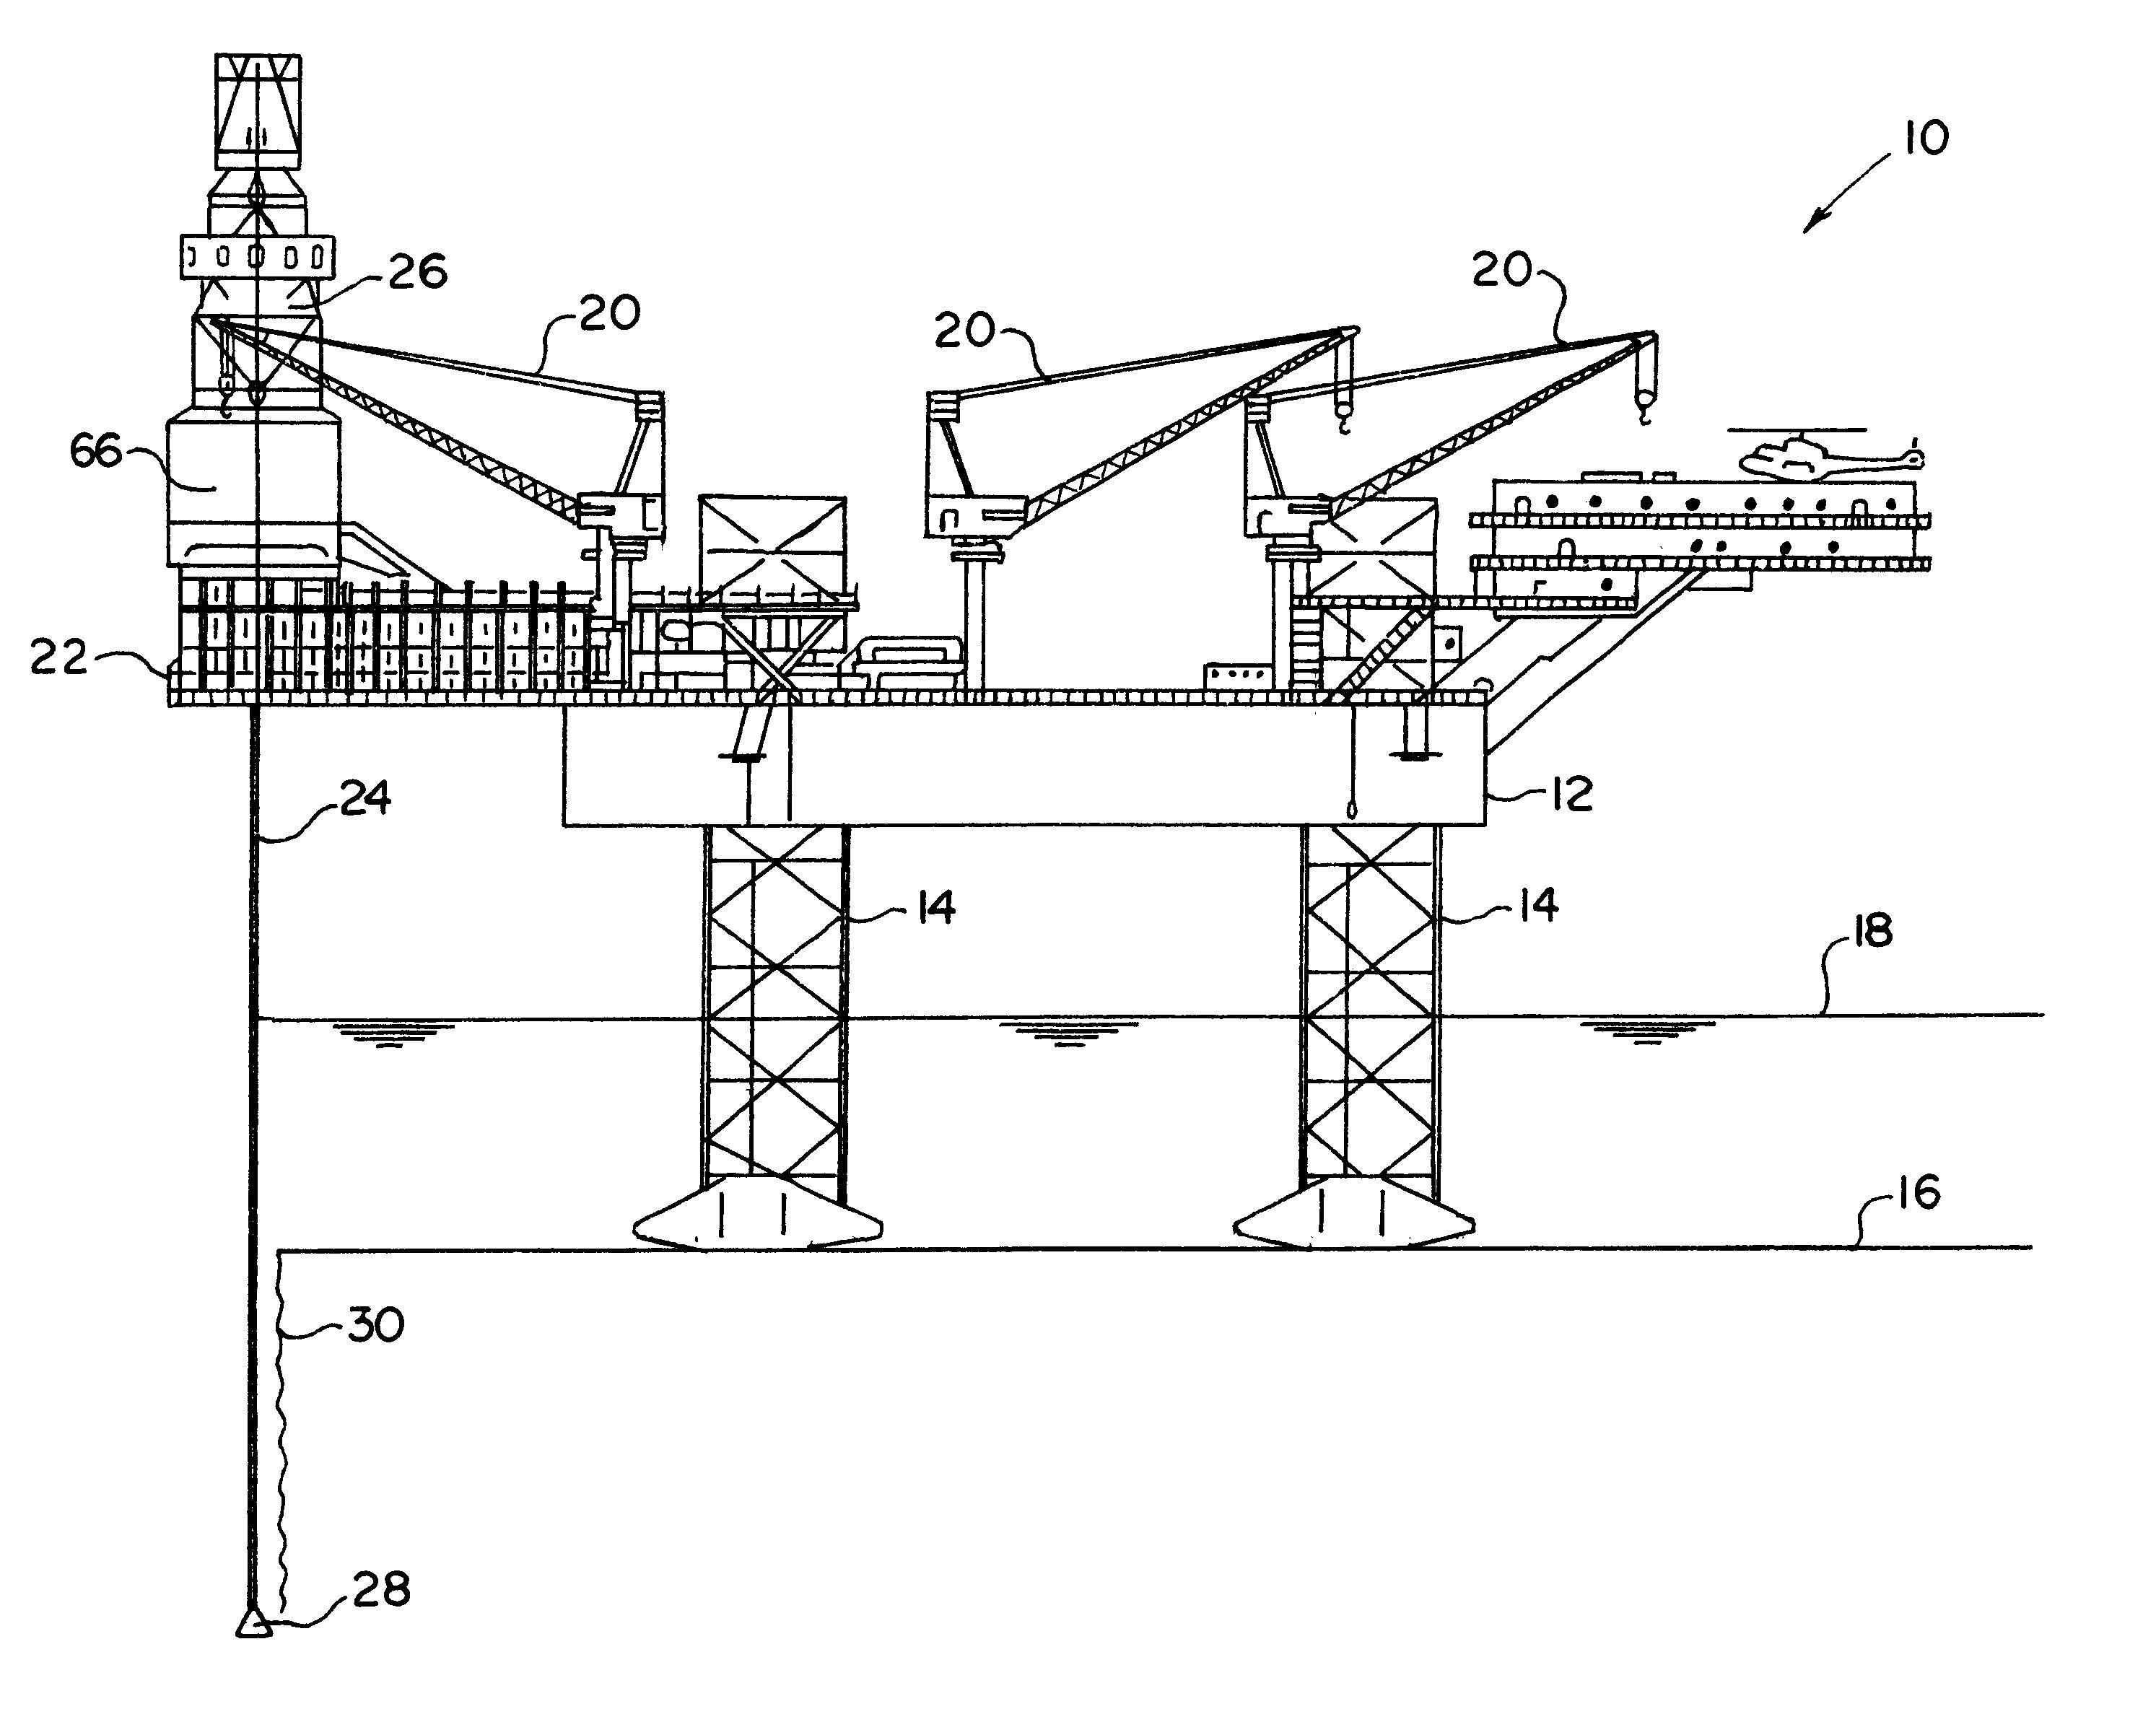 oil rig diagram venn template word instrumentation usxcleague